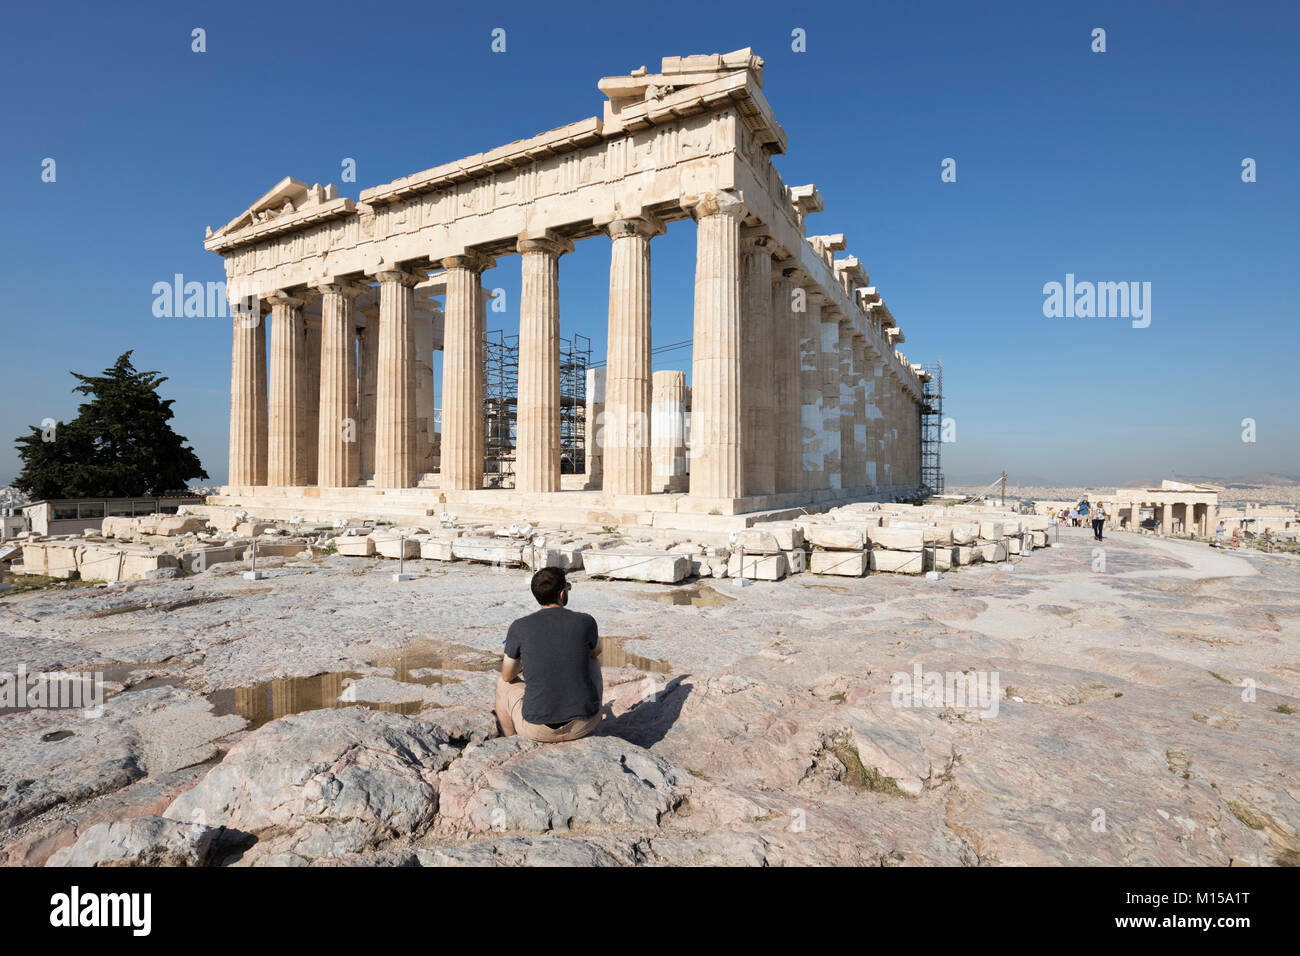 The ancient Parthenon atop the Acropolis, Athens, Greece, Europe - Stock Image